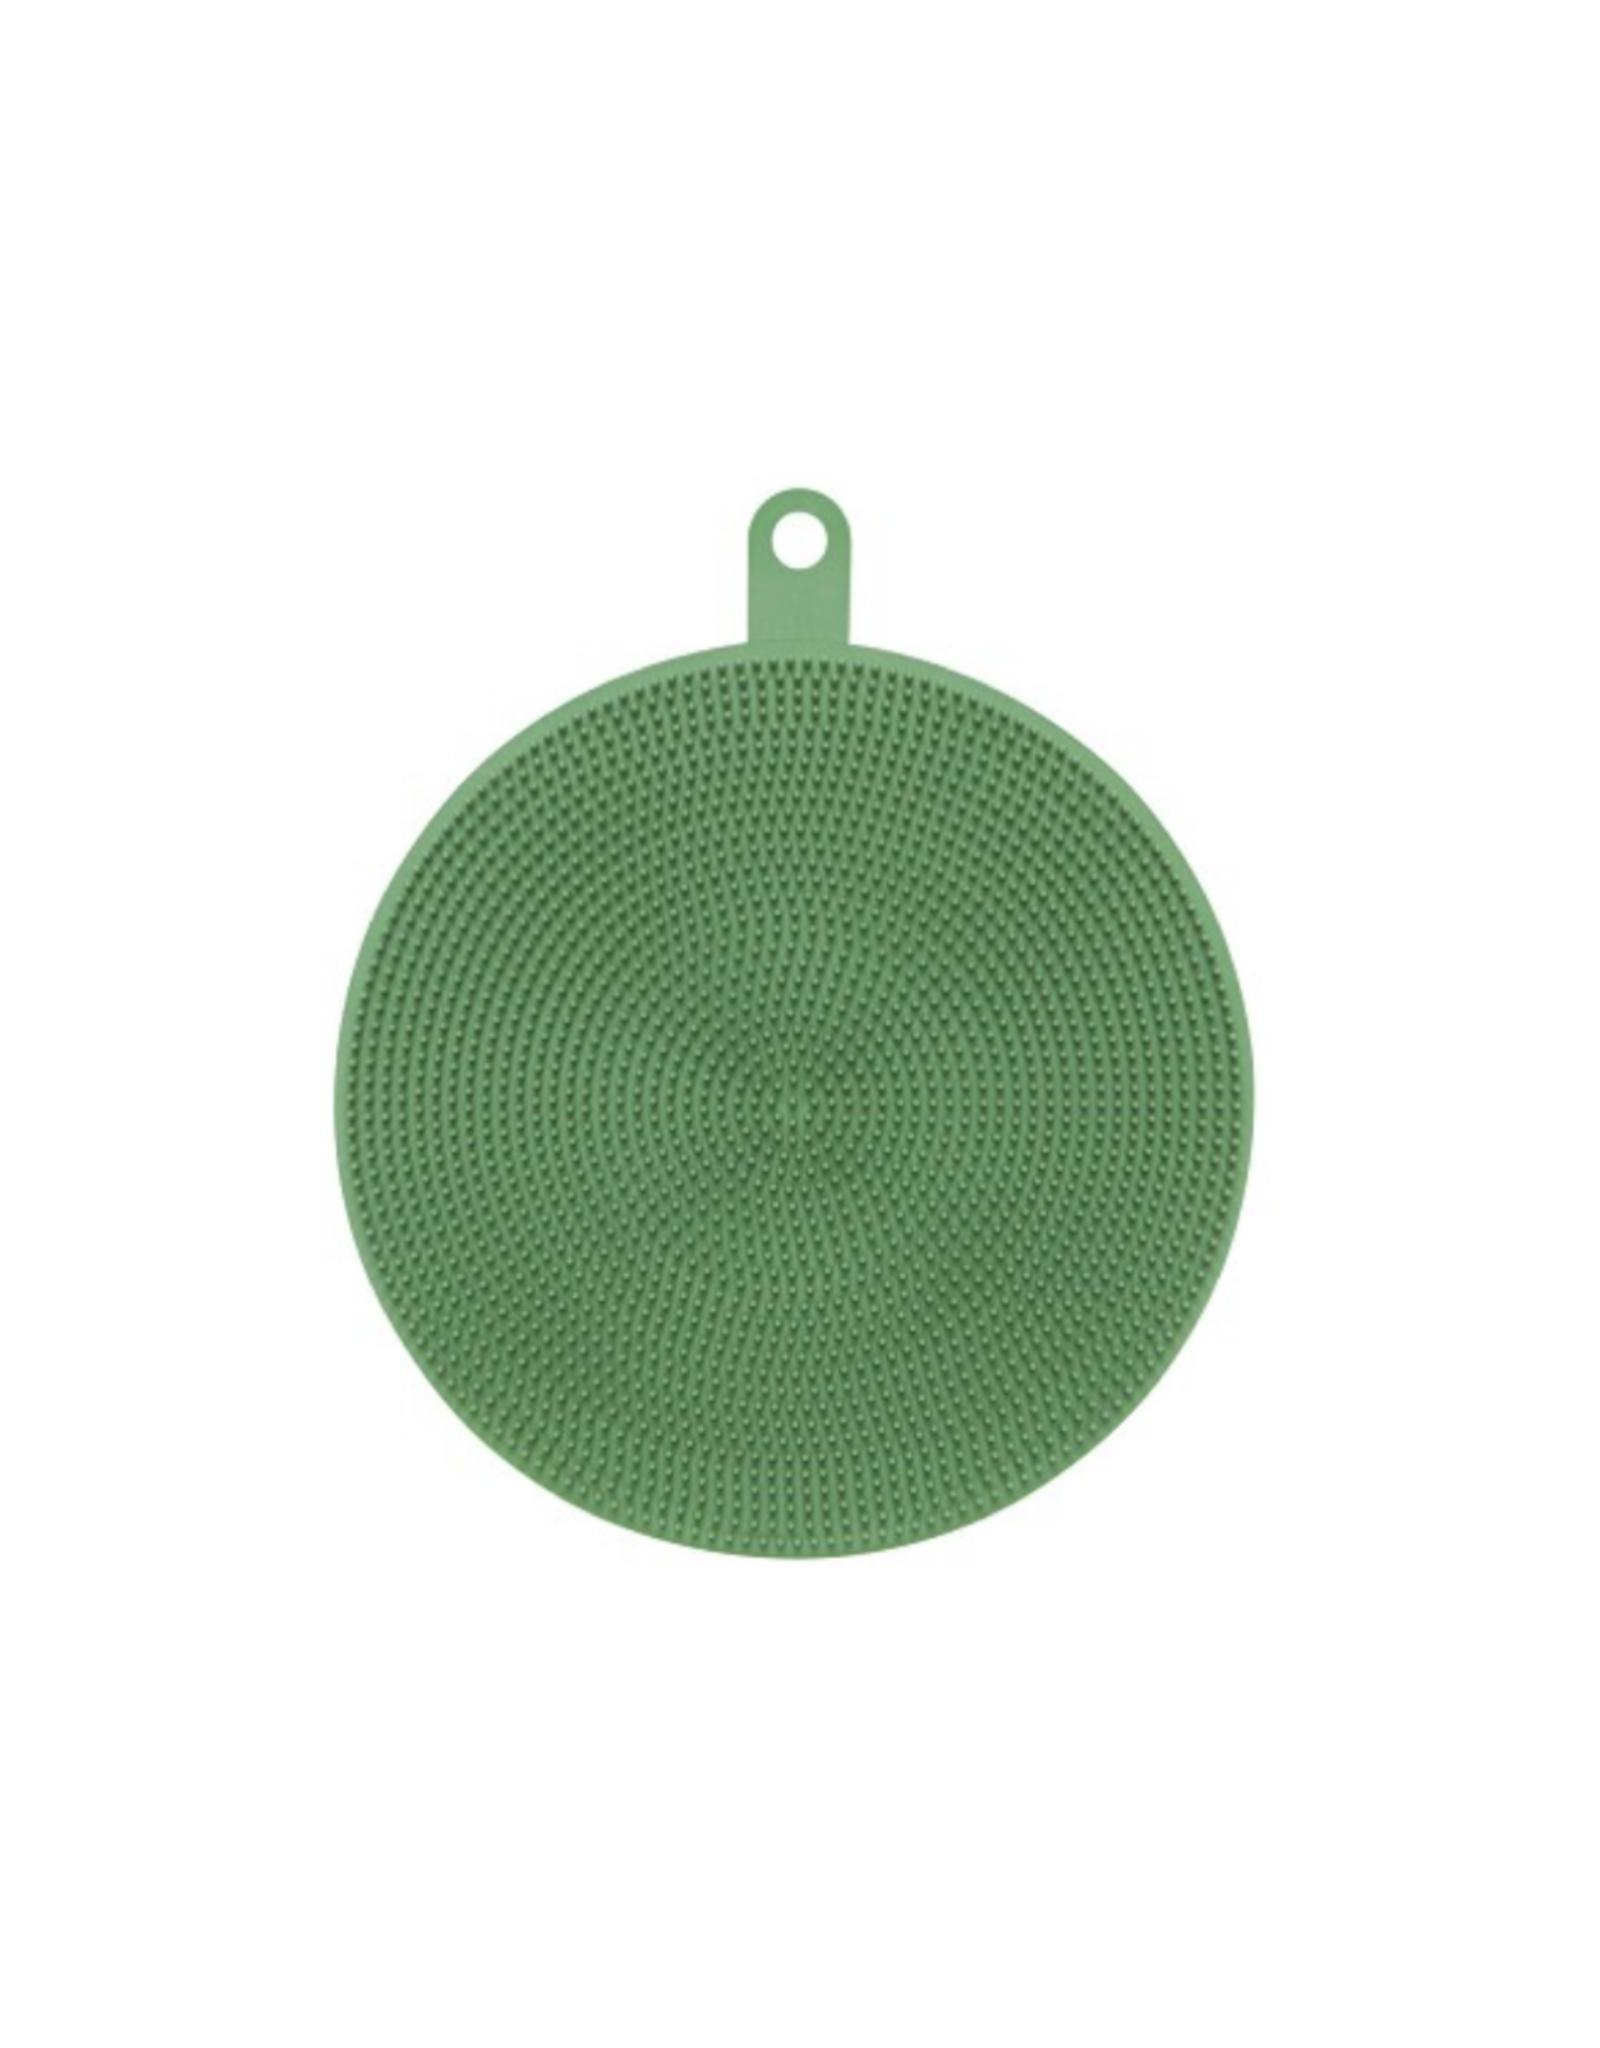 DCA - Scrub or Soap Rest / Silicone, Green